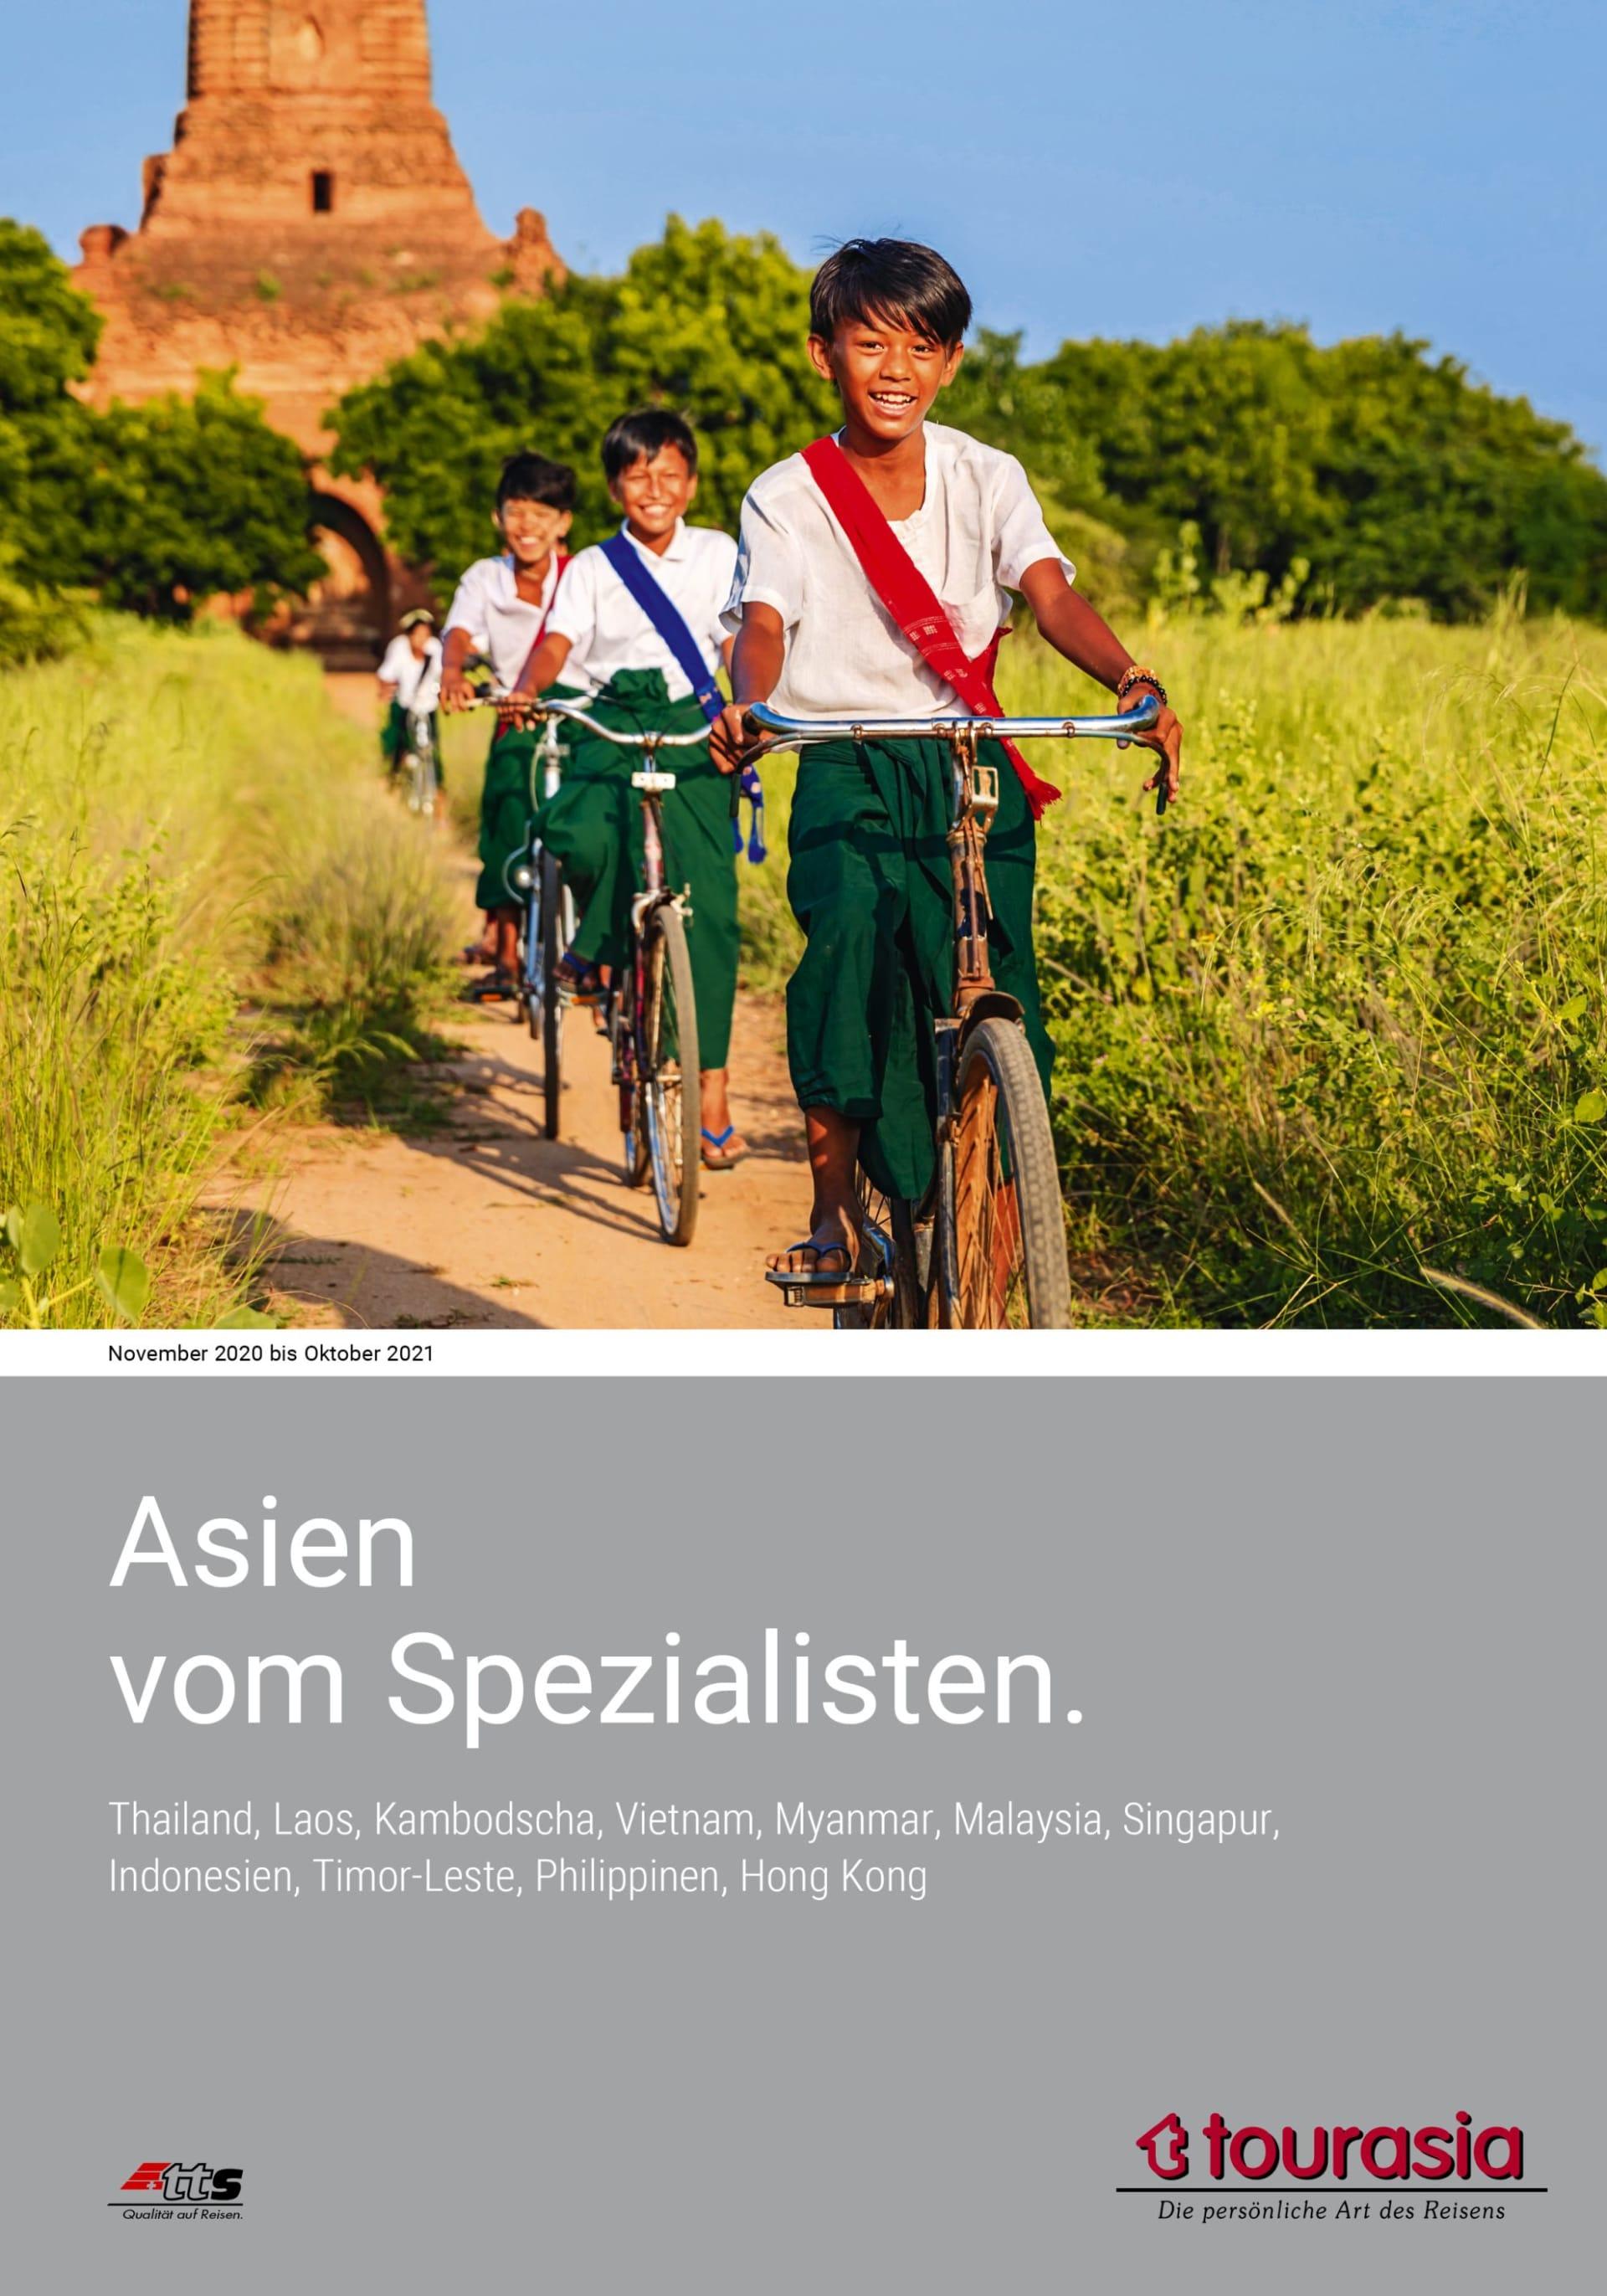 Asien: November 2020 - Oktober 2021